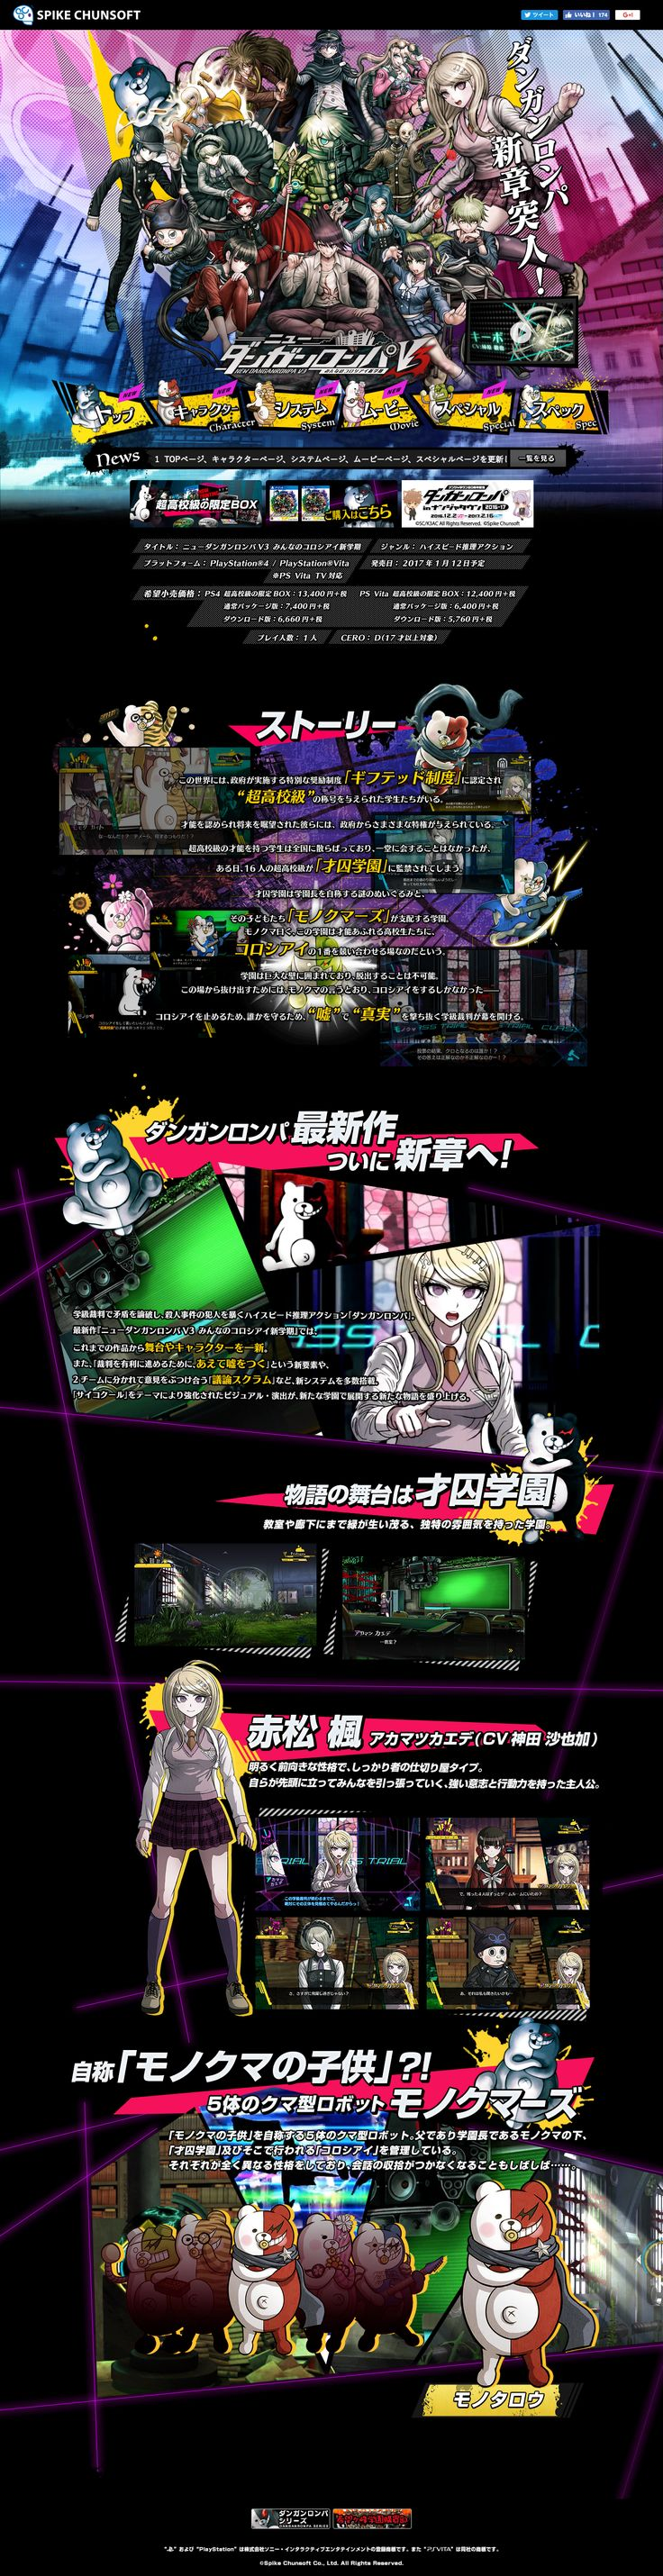 New Danganronpa v3 (Japanese) #WebDesign